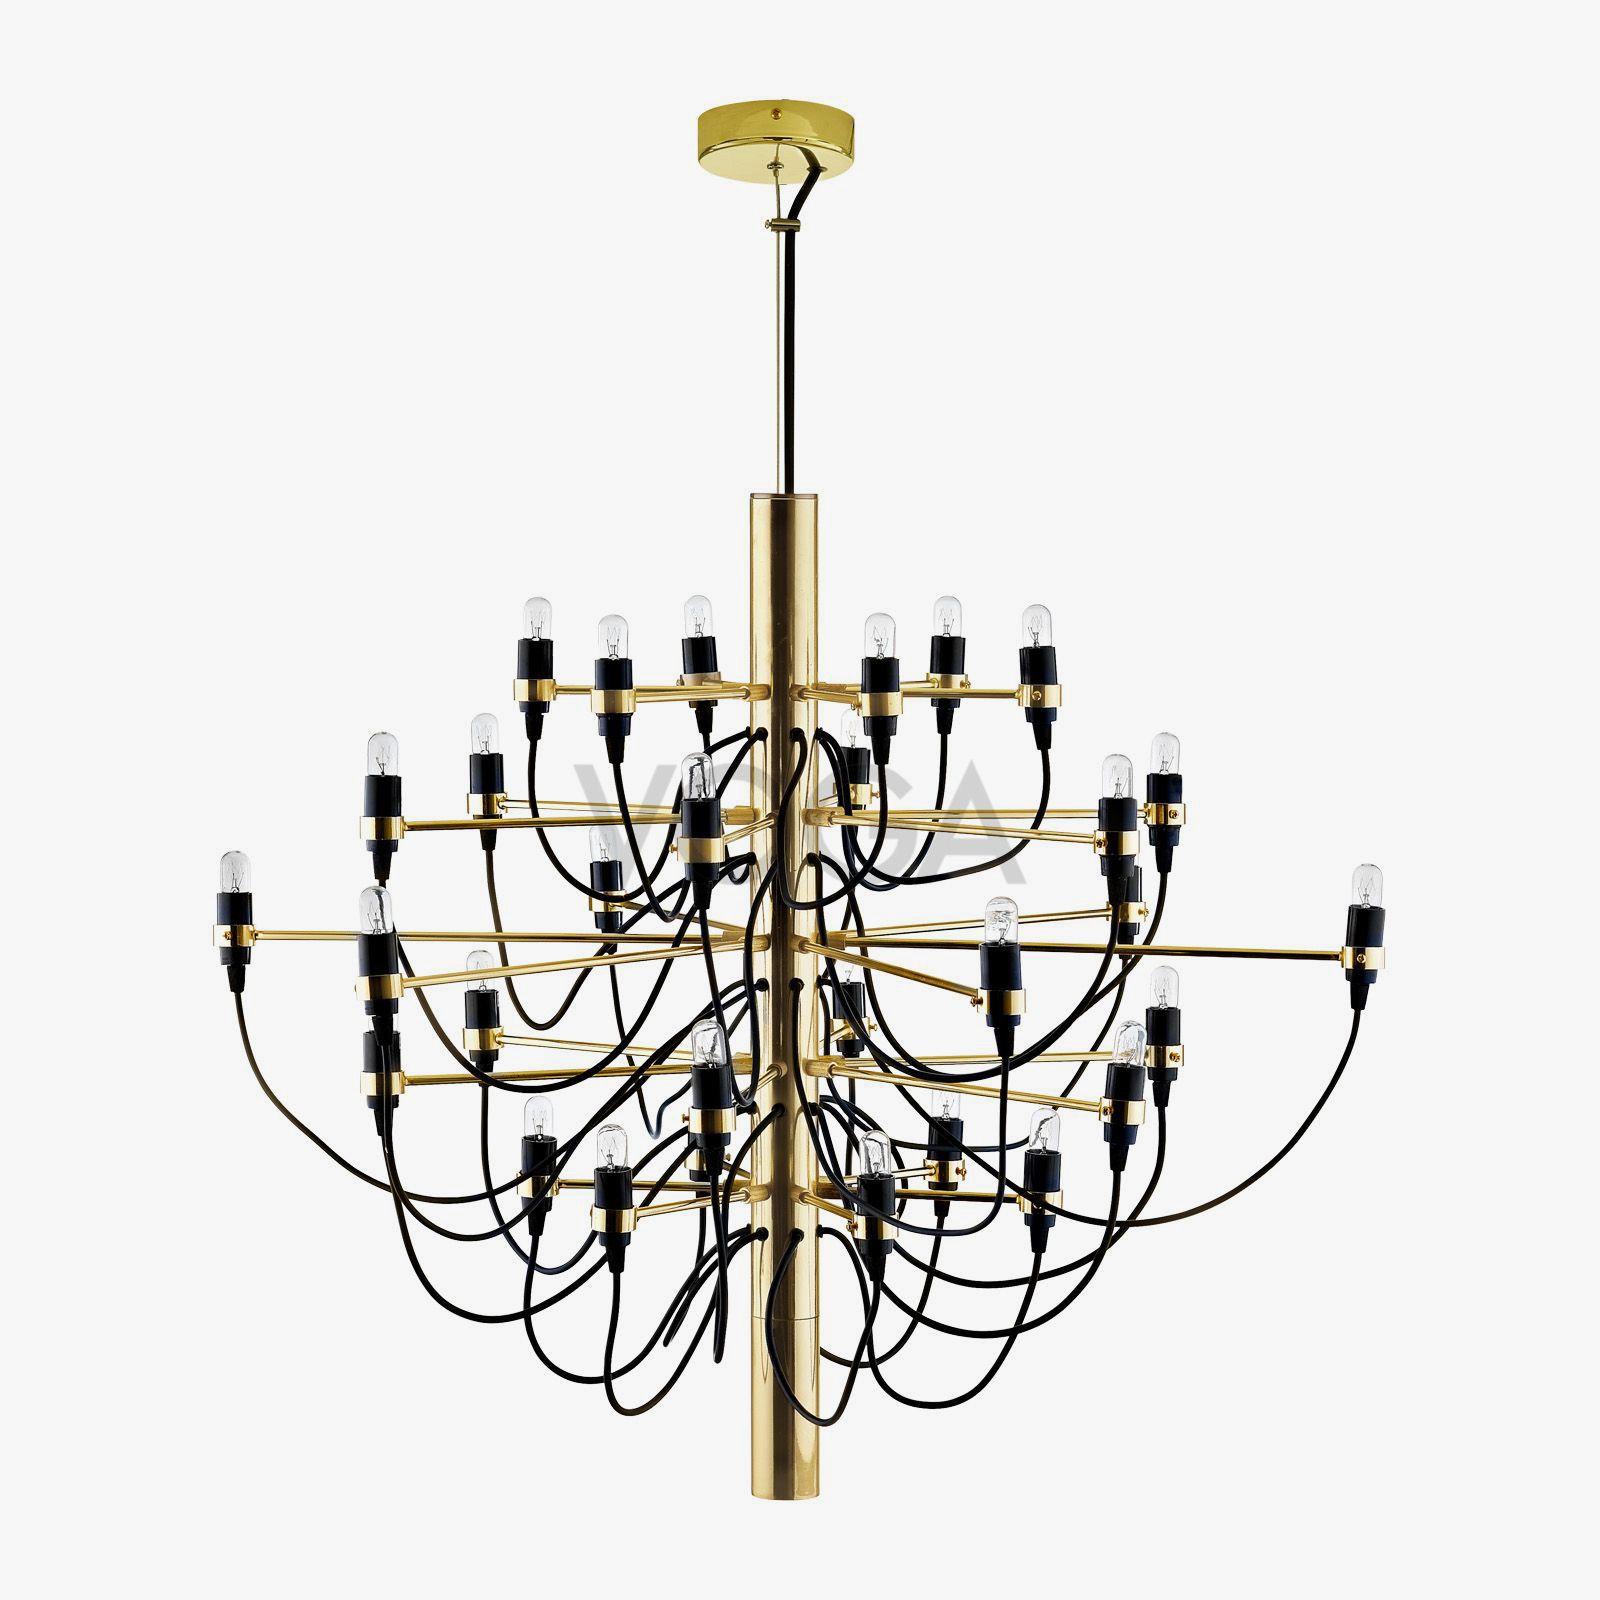 Gino Sarfatti Chandelier Designer Lamps Voga In 2020